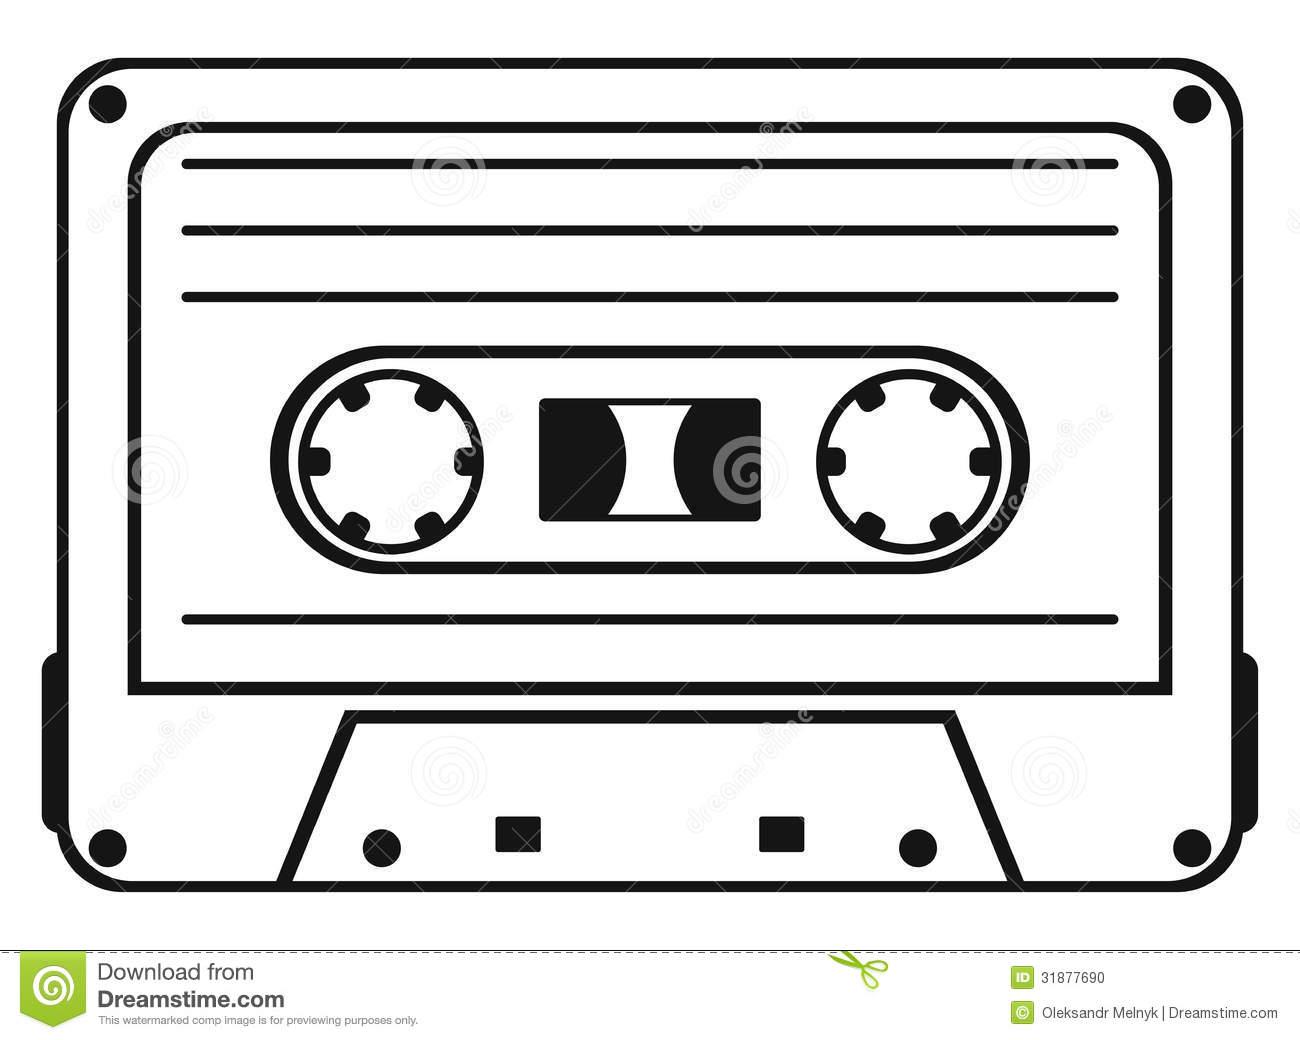 Cassette Tape Stock Photo Image 31877690-Cassette Tape Stock Photo Image 31877690-7